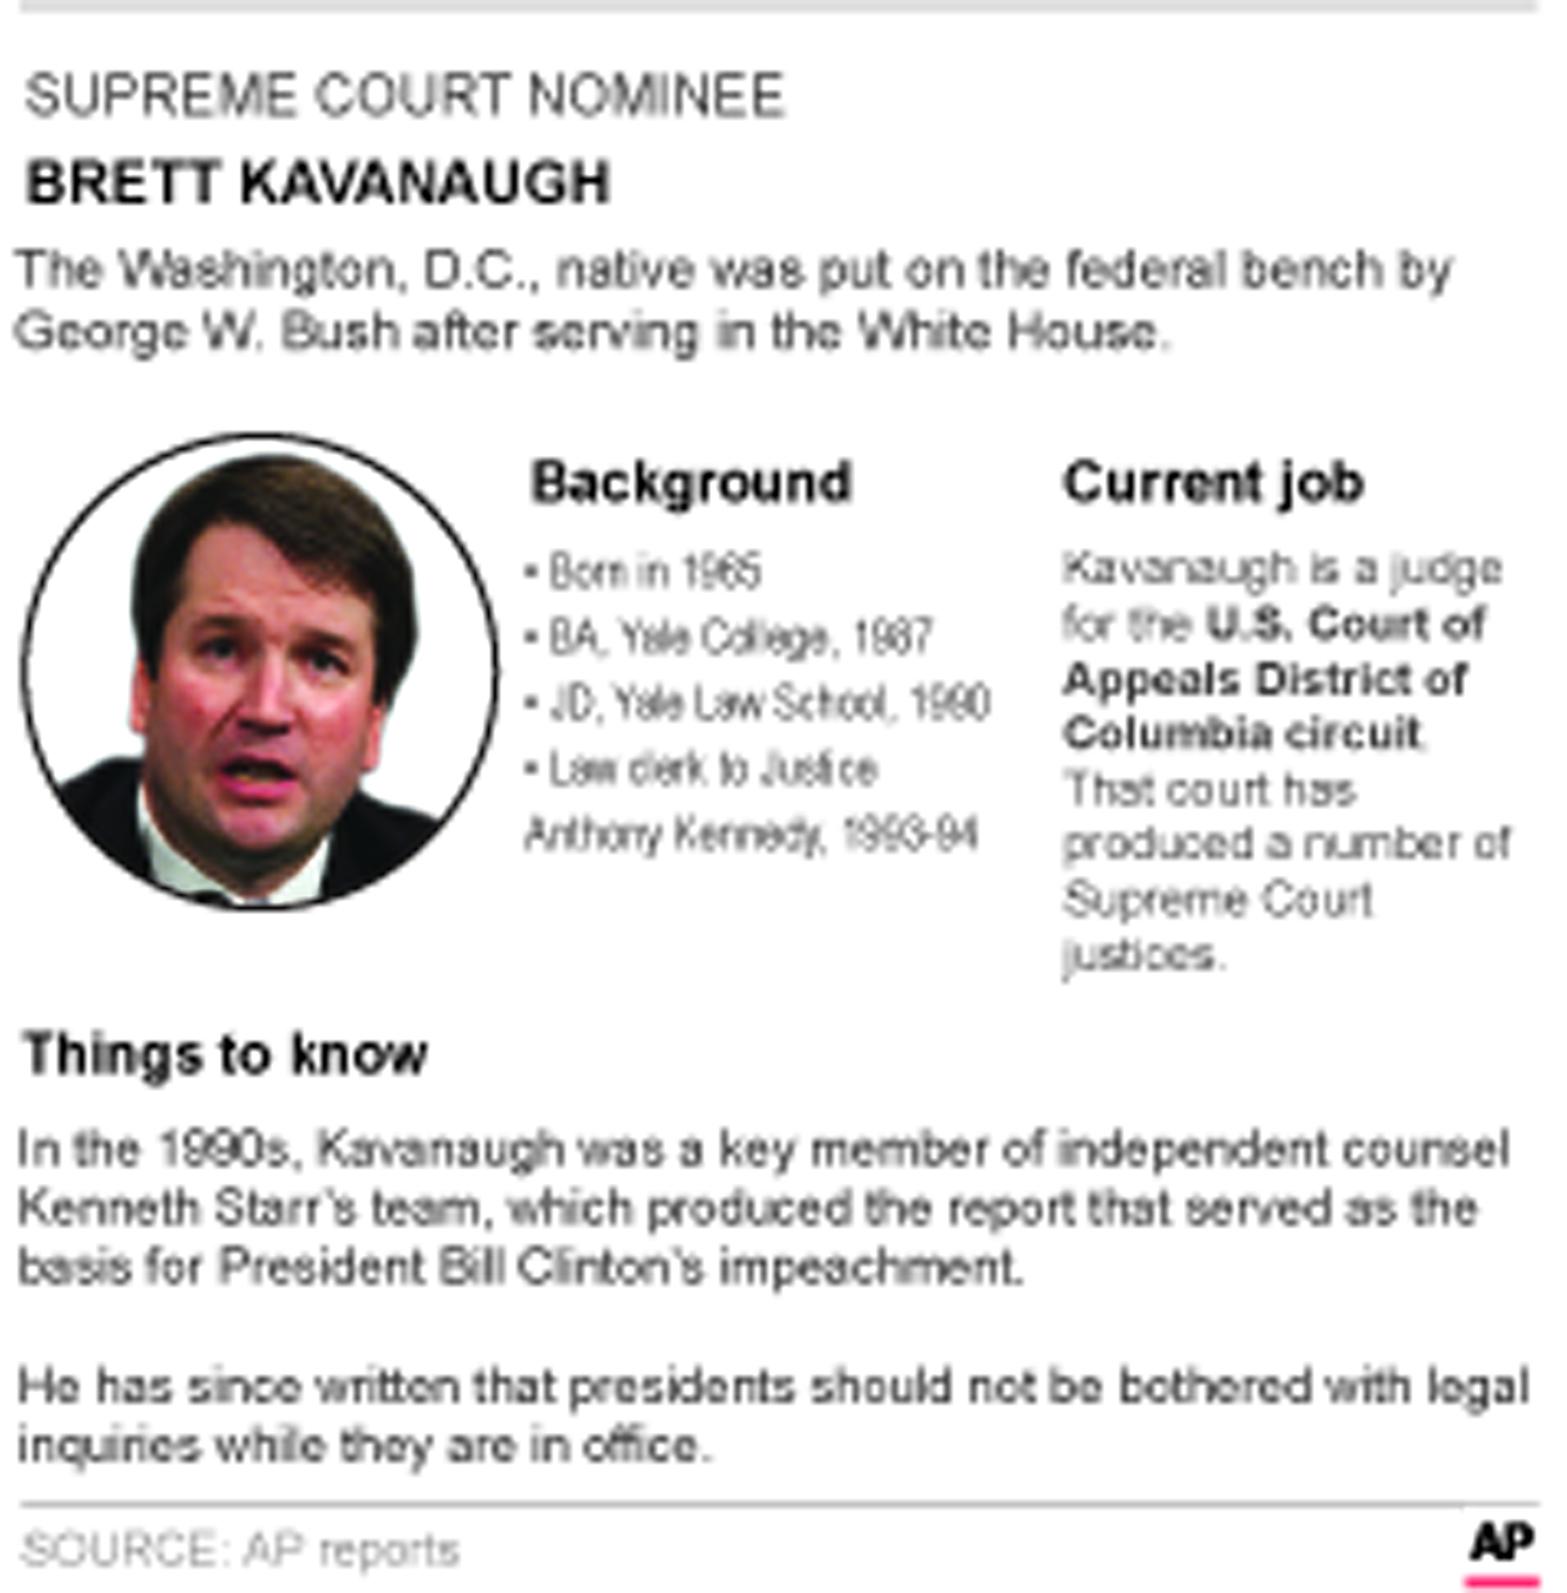 Trump Picks Kavanaugh, A GOP Favorite, For Supreme Court